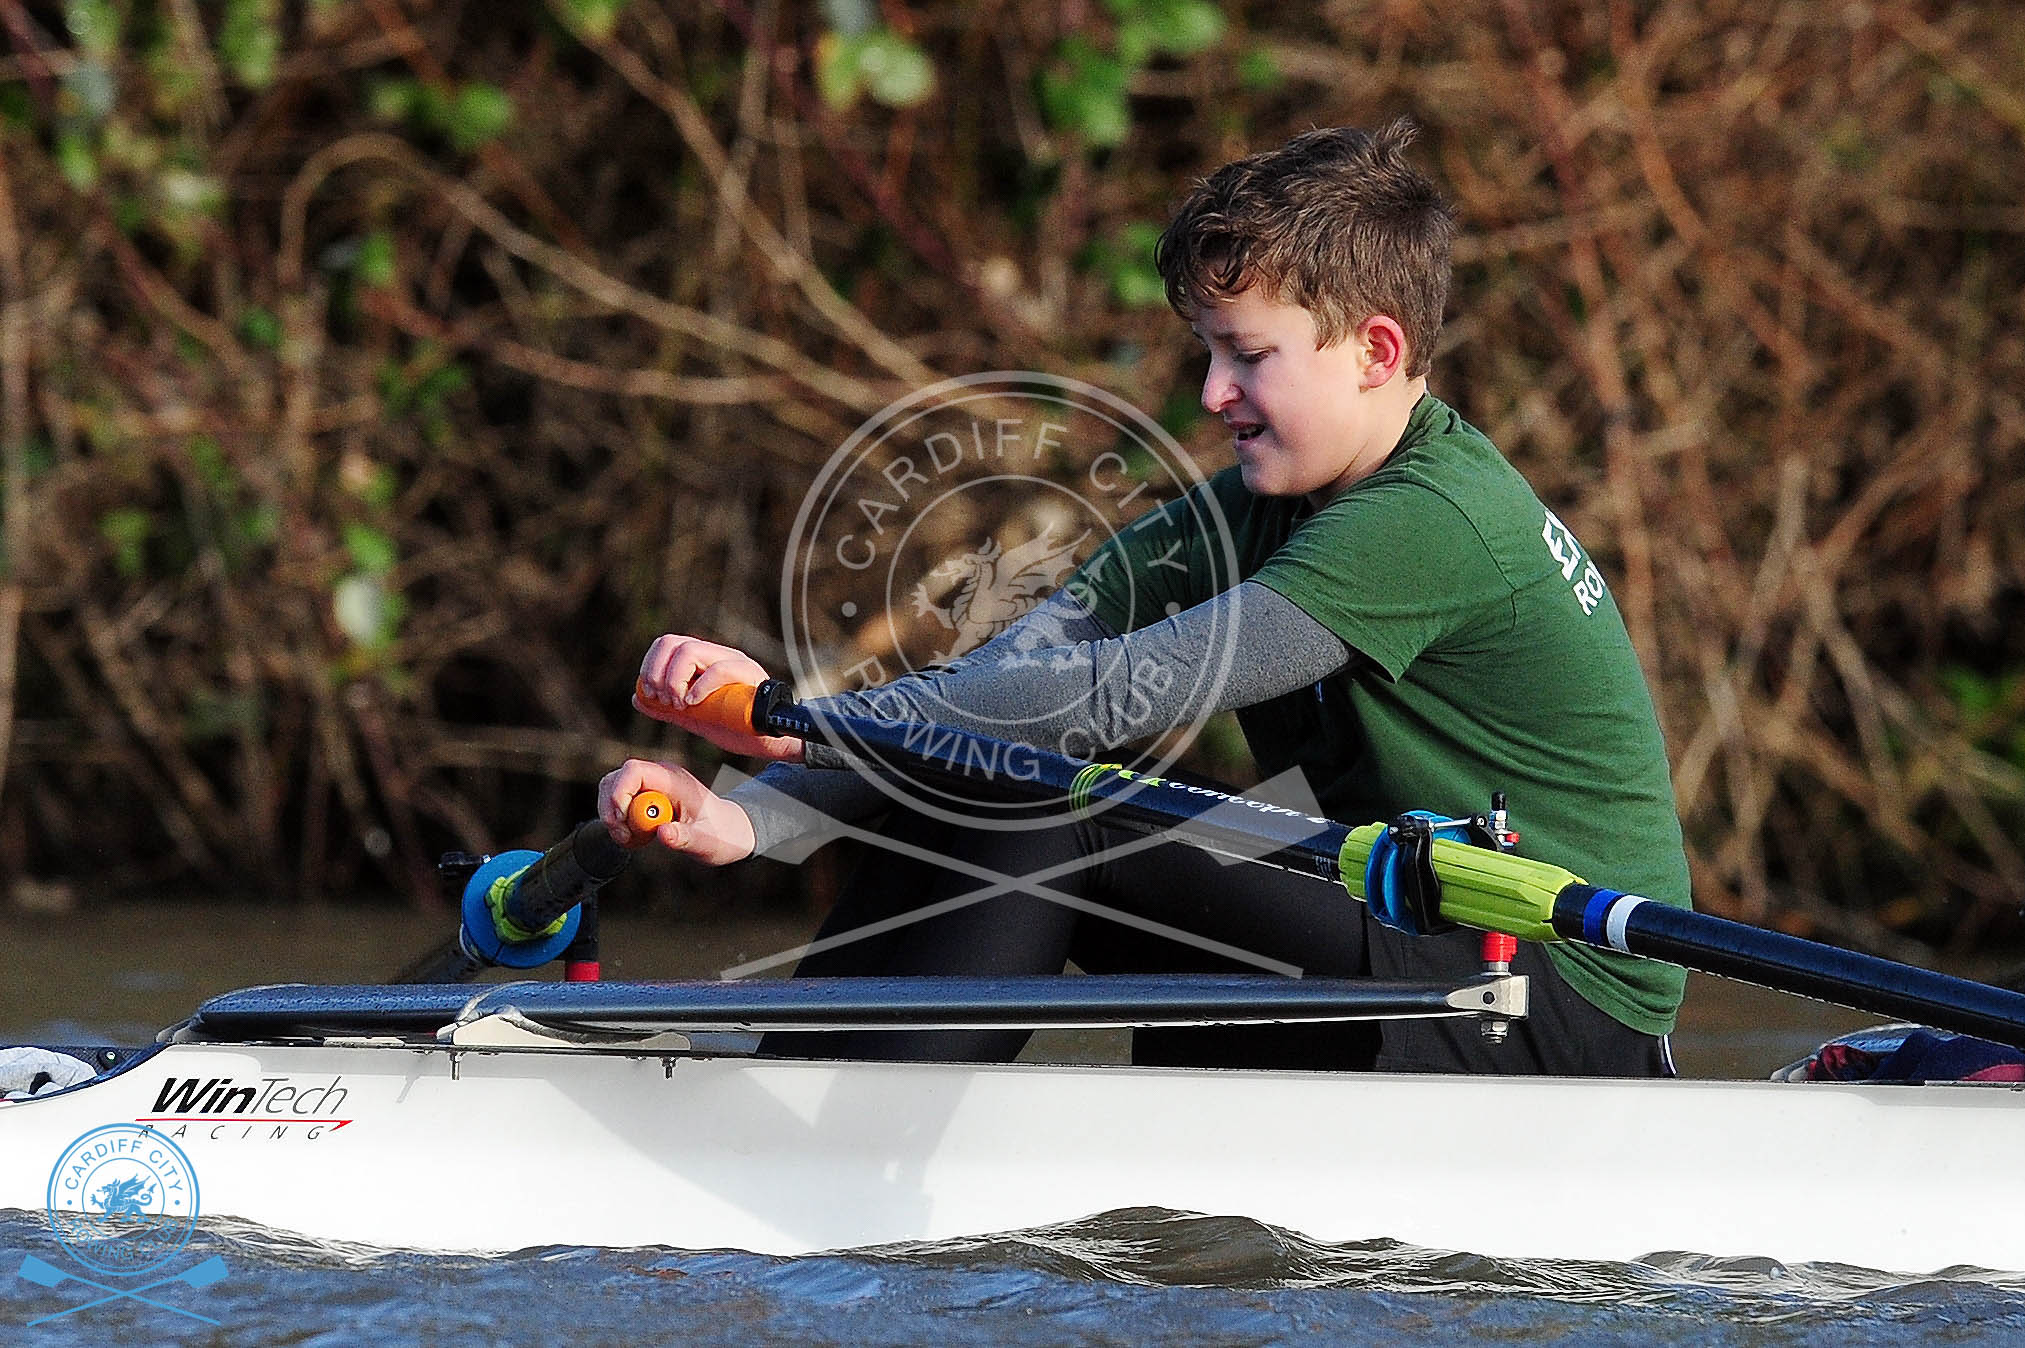 DW_280119_Cardiff_City_Rowing_327.jpg